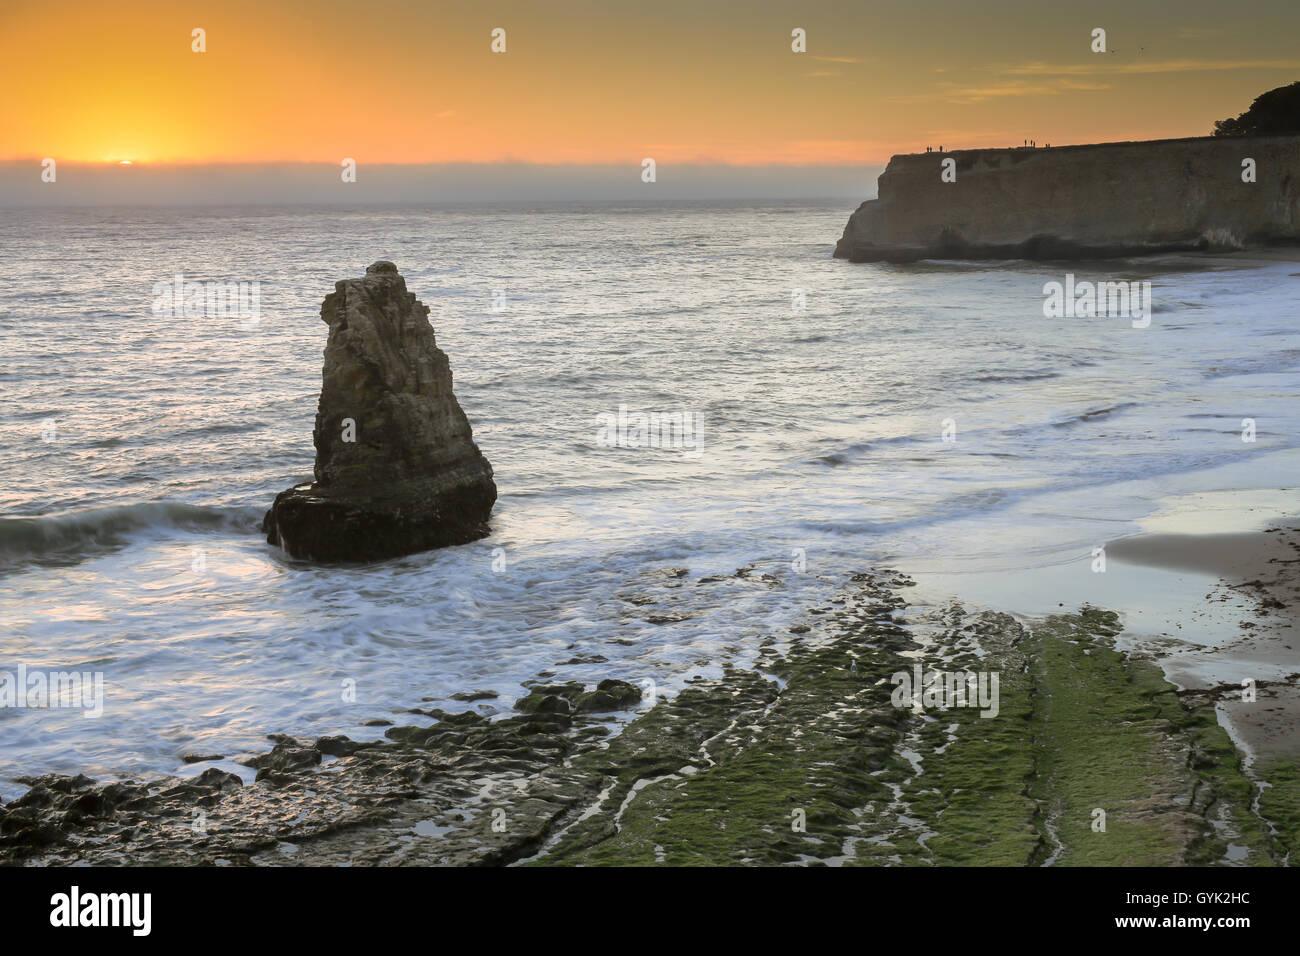 Pacific Ocean sunset from San Vicente Creek, Davenport, California, USA - Stock Image